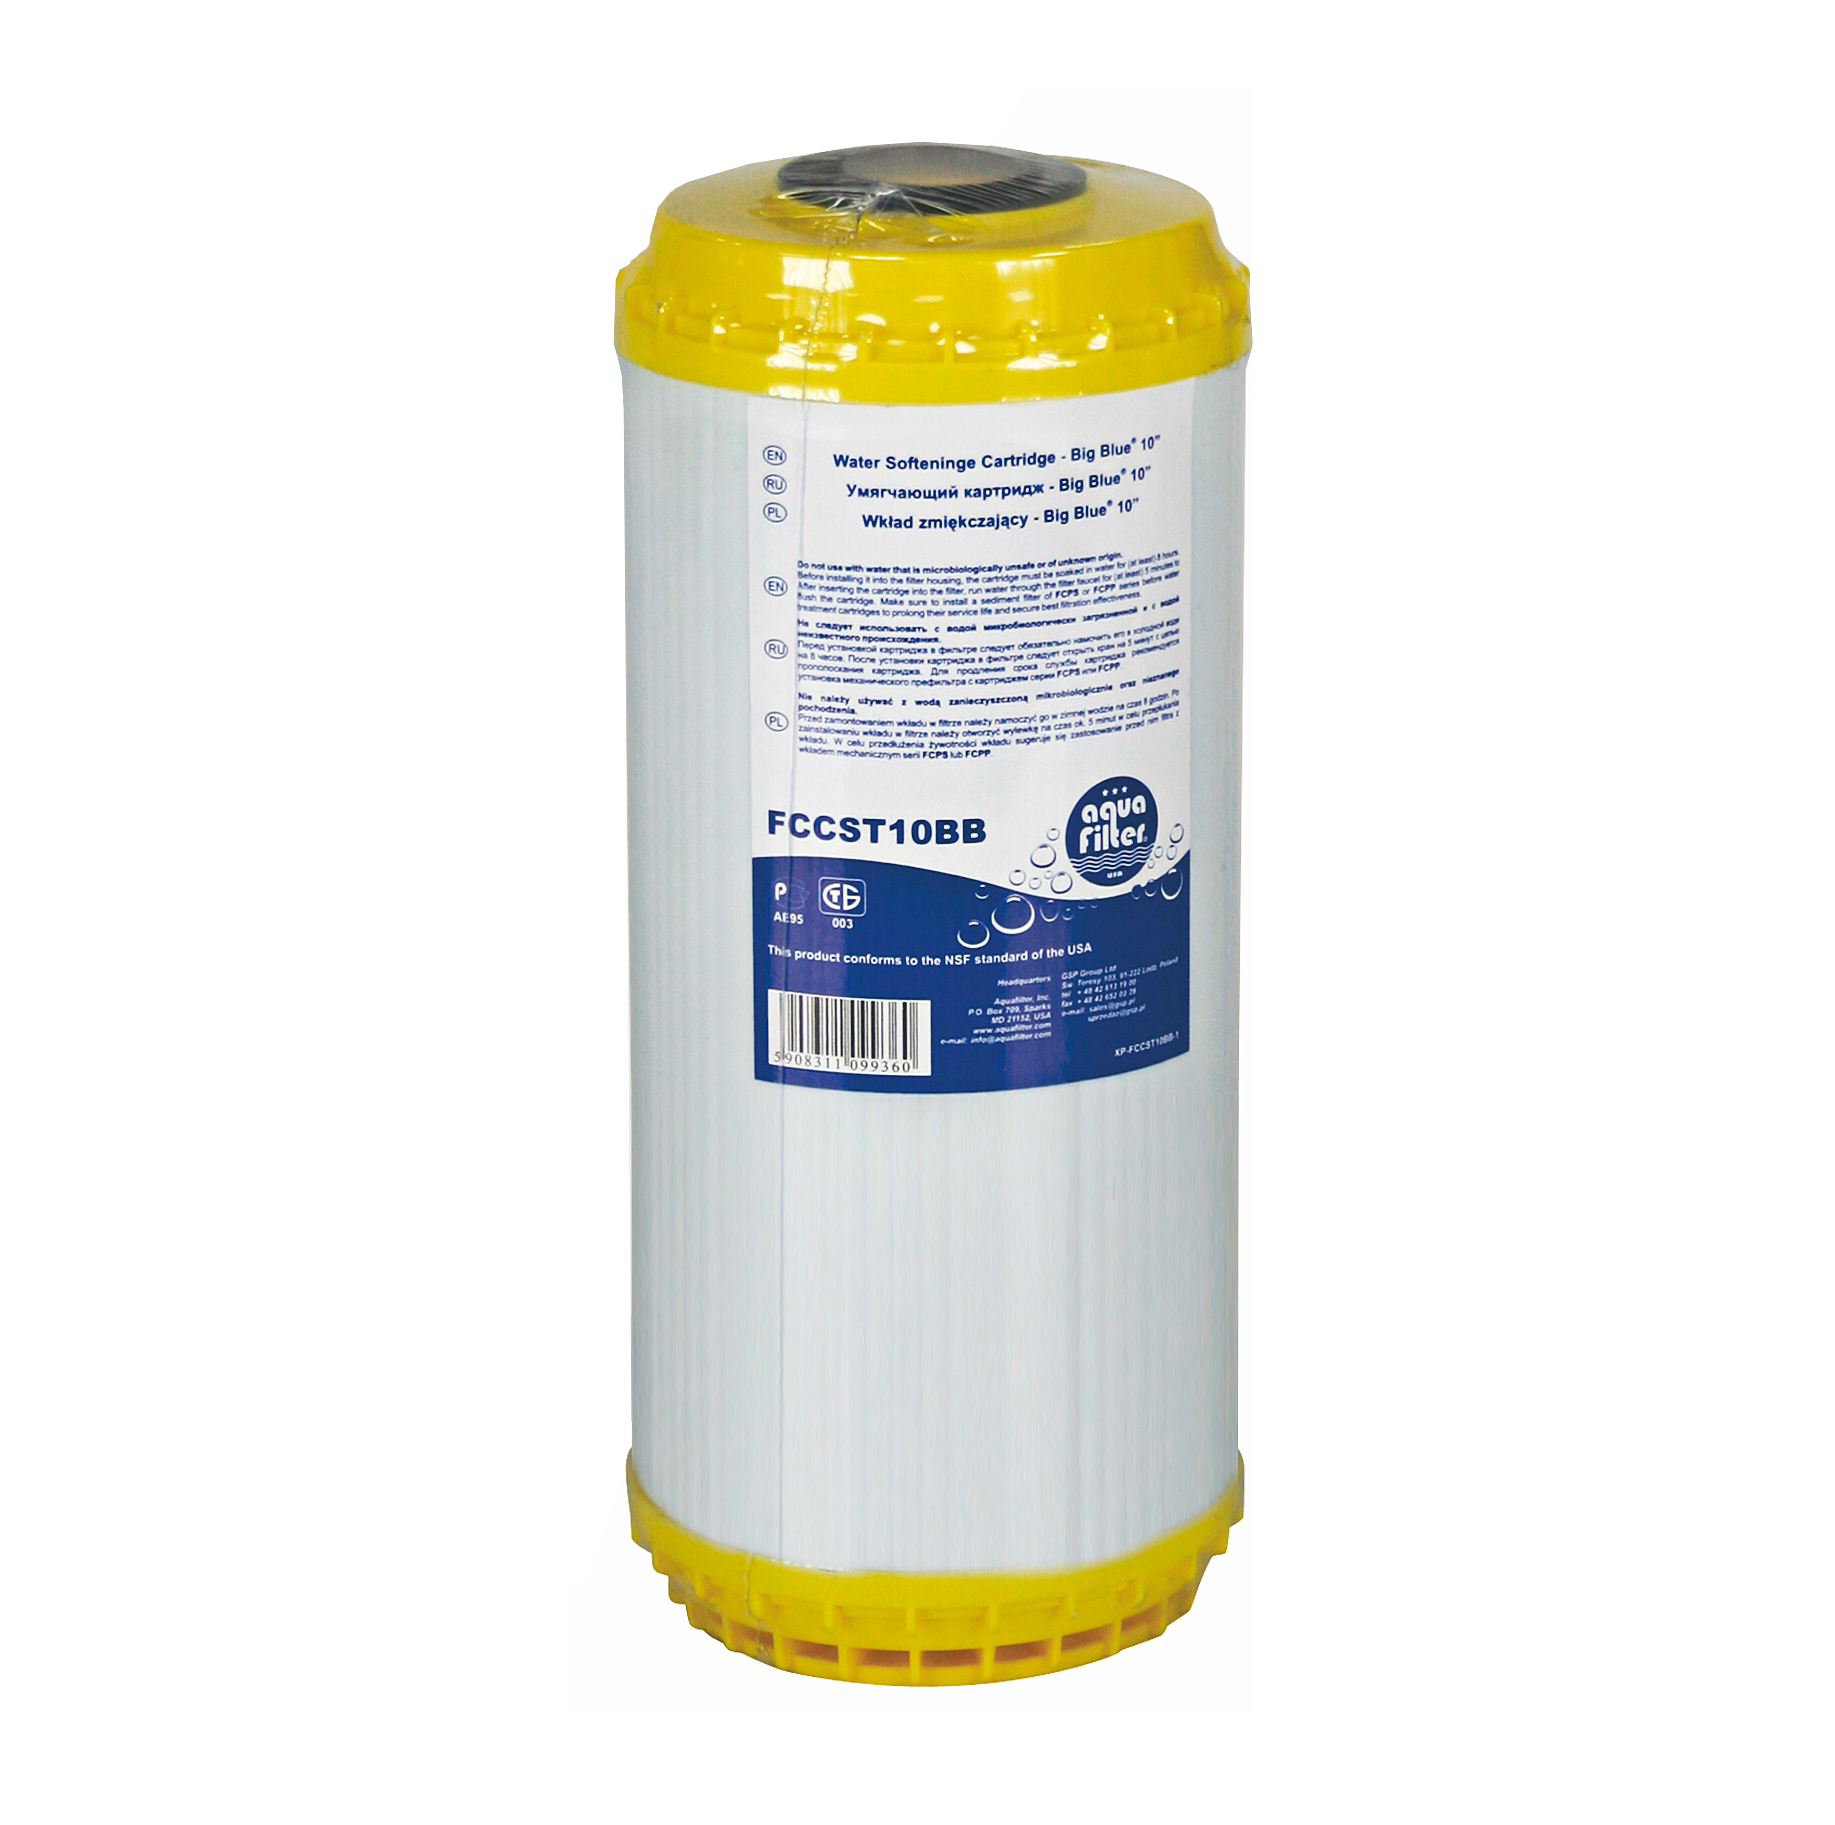 Картридж Aquafilter Fccst10bb картридж aquafilter 10bb fccst10bb